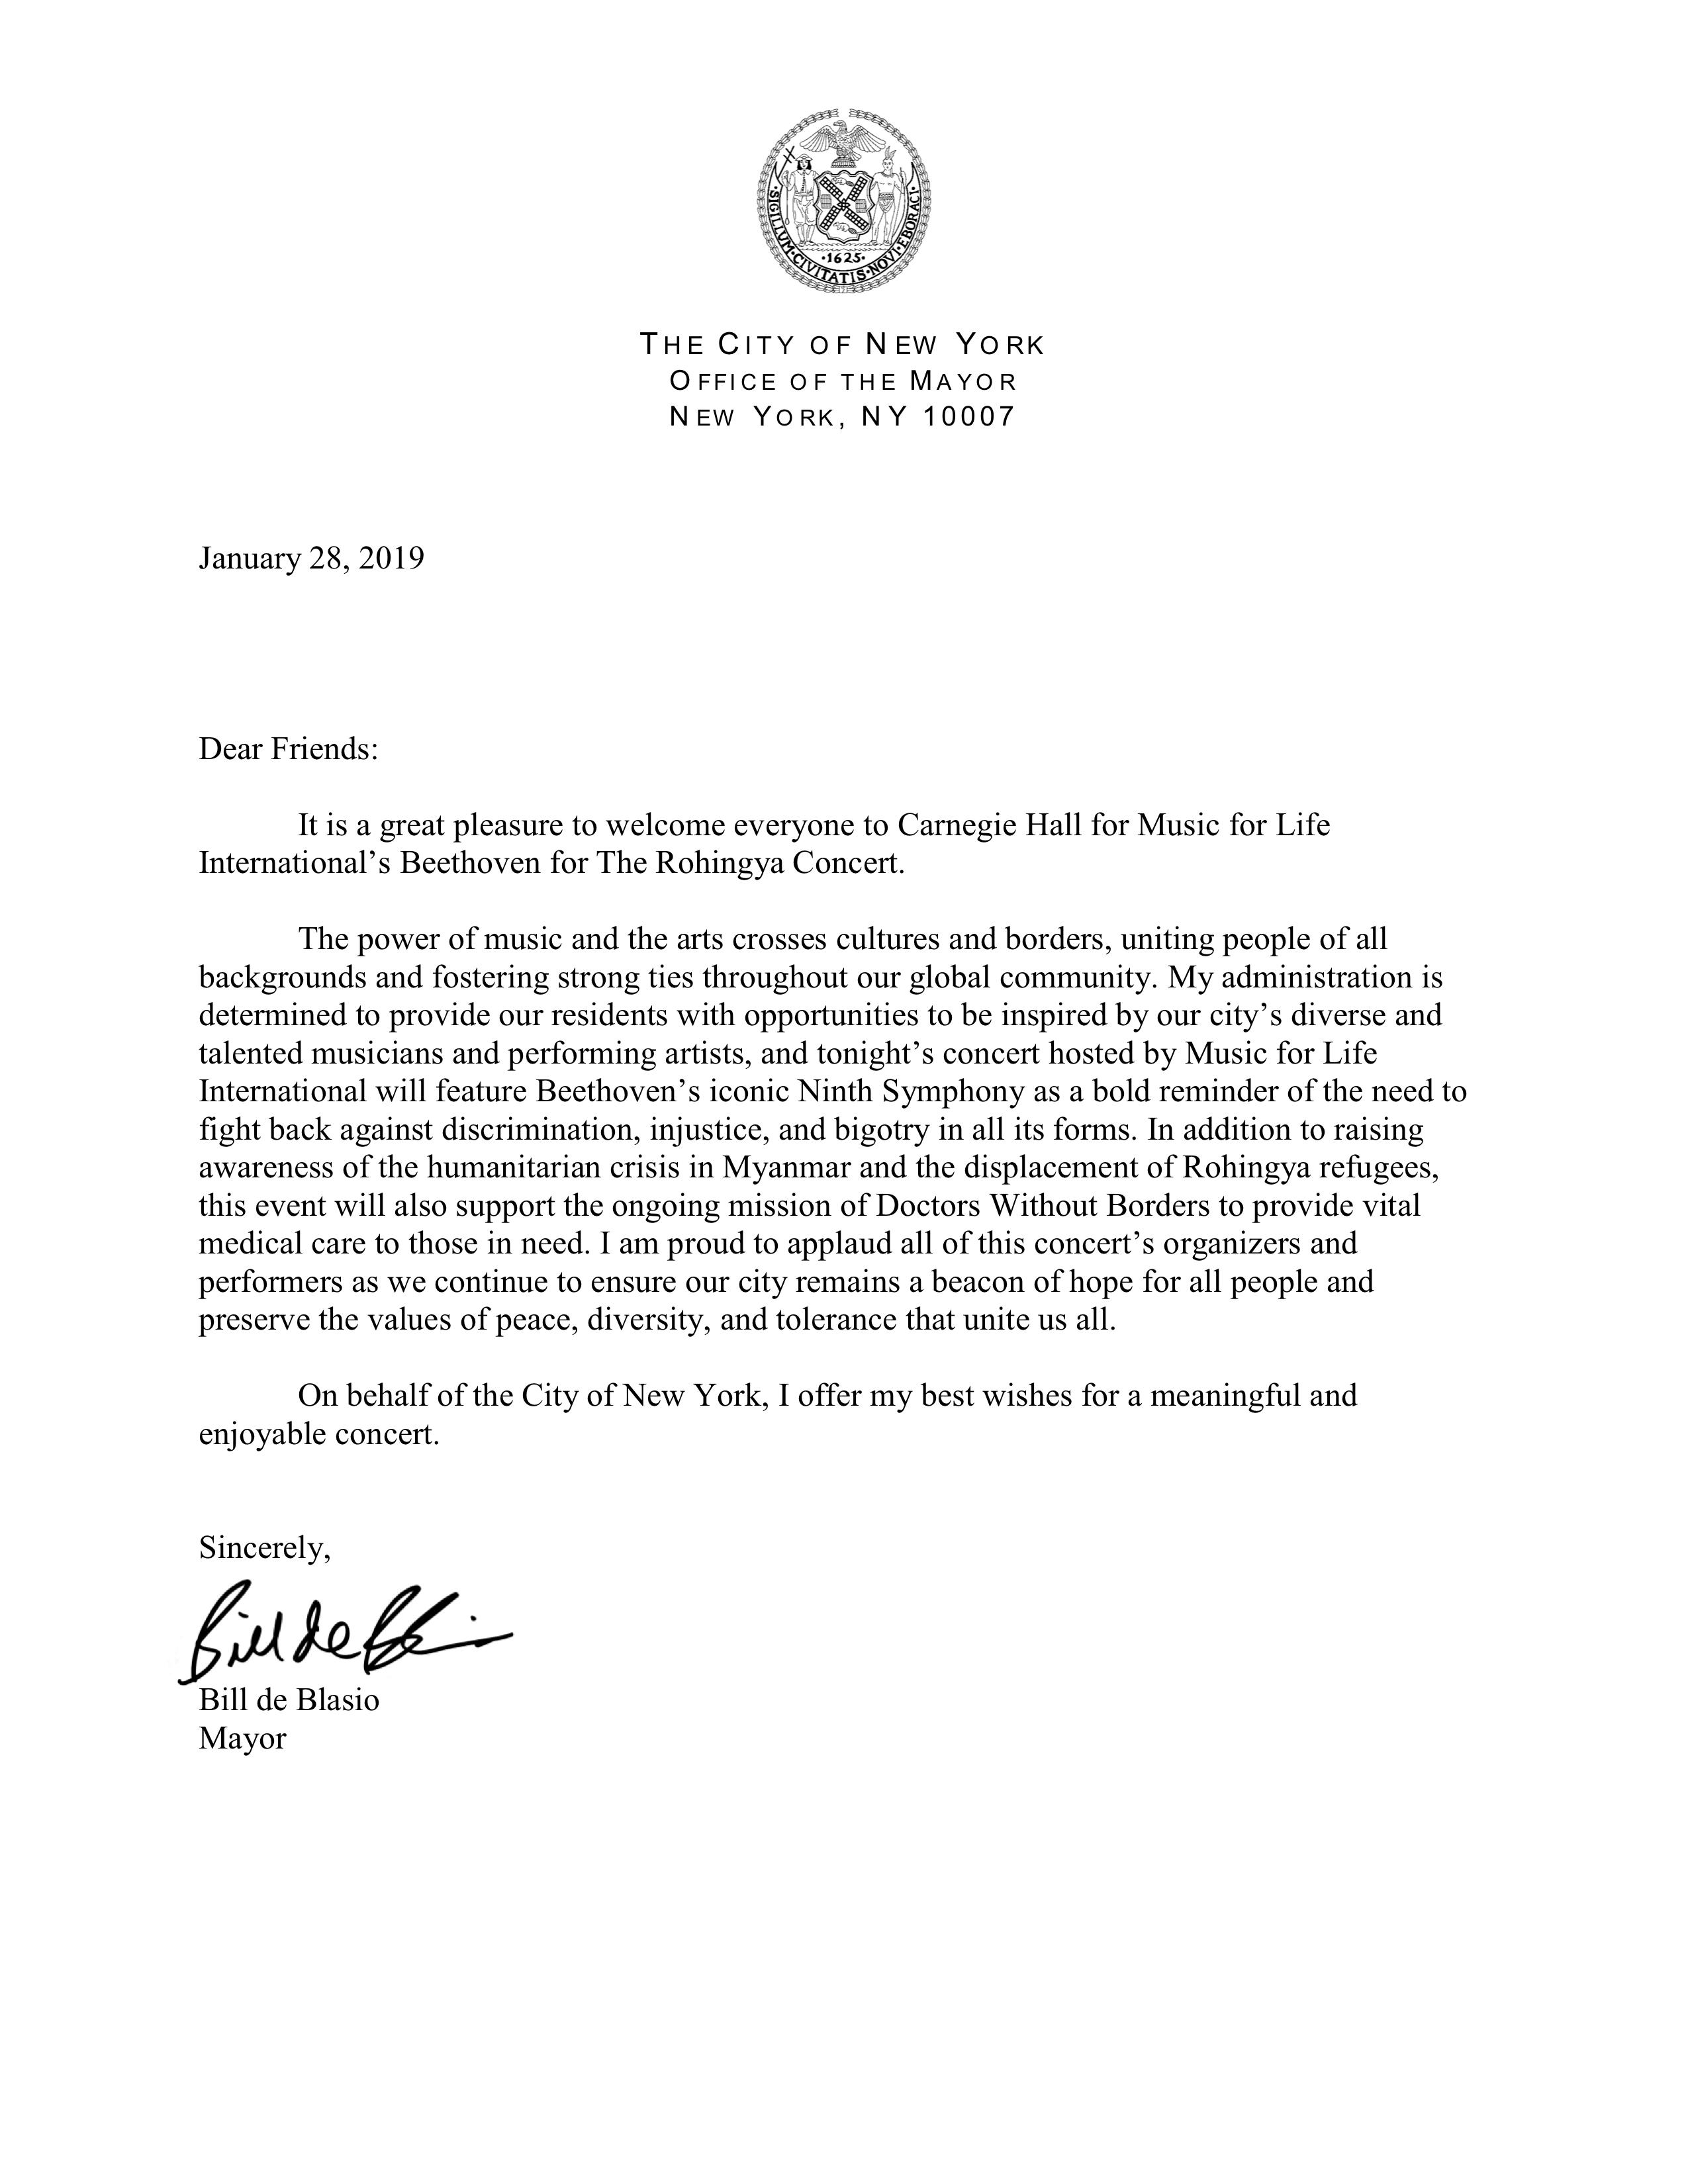 Mayor's Message Bill de Blasio for Carnegie Hall